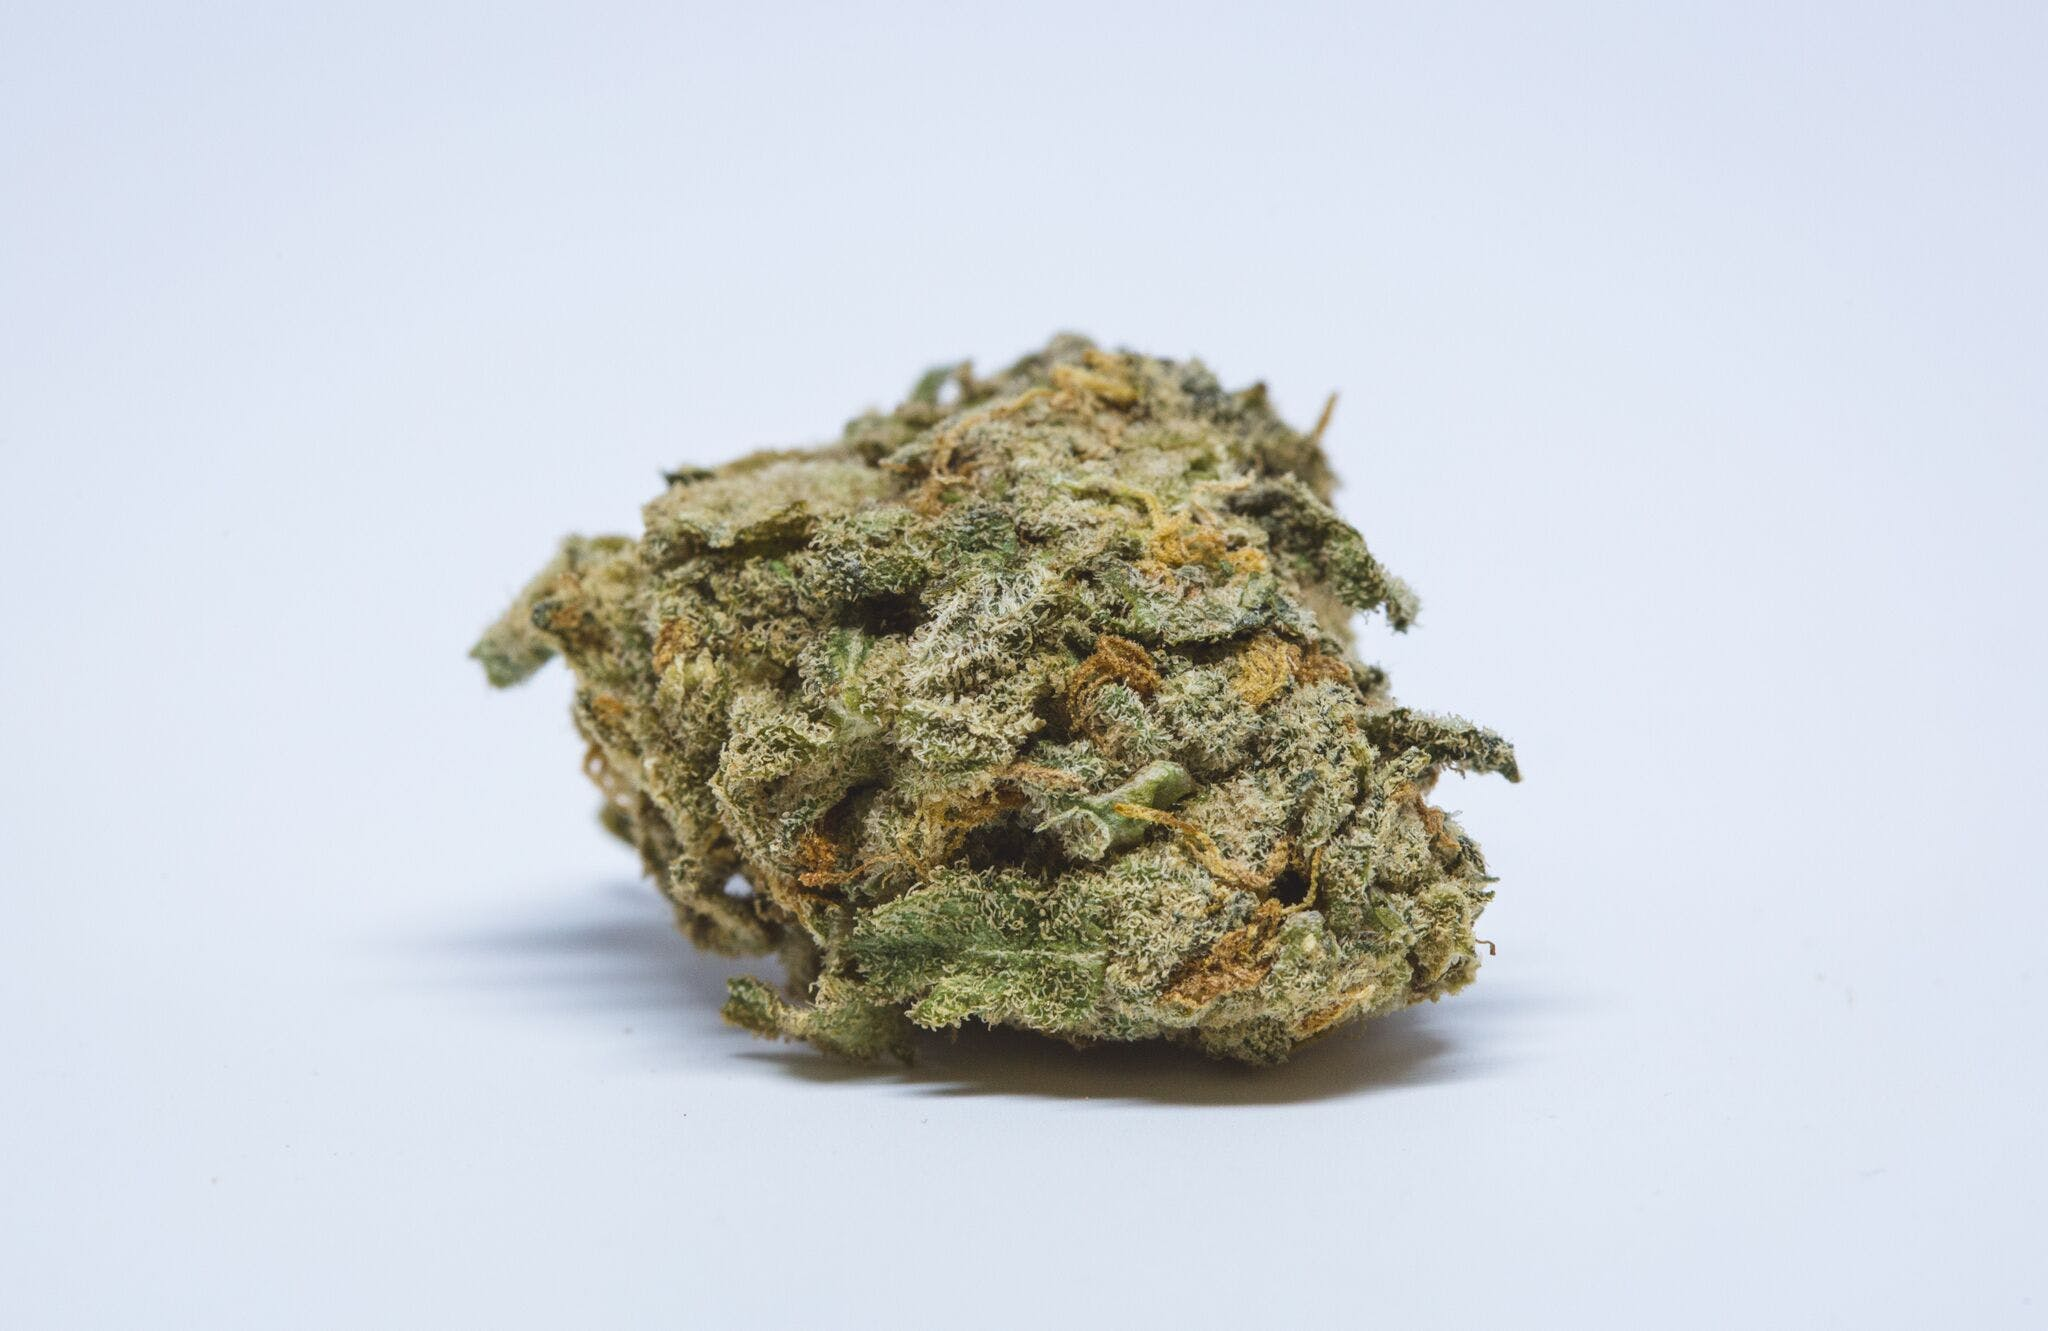 Blue Rhino Weed; Blue Rhino Cannabis Strain, Blue Rhino Hybrid Marijuana Strain